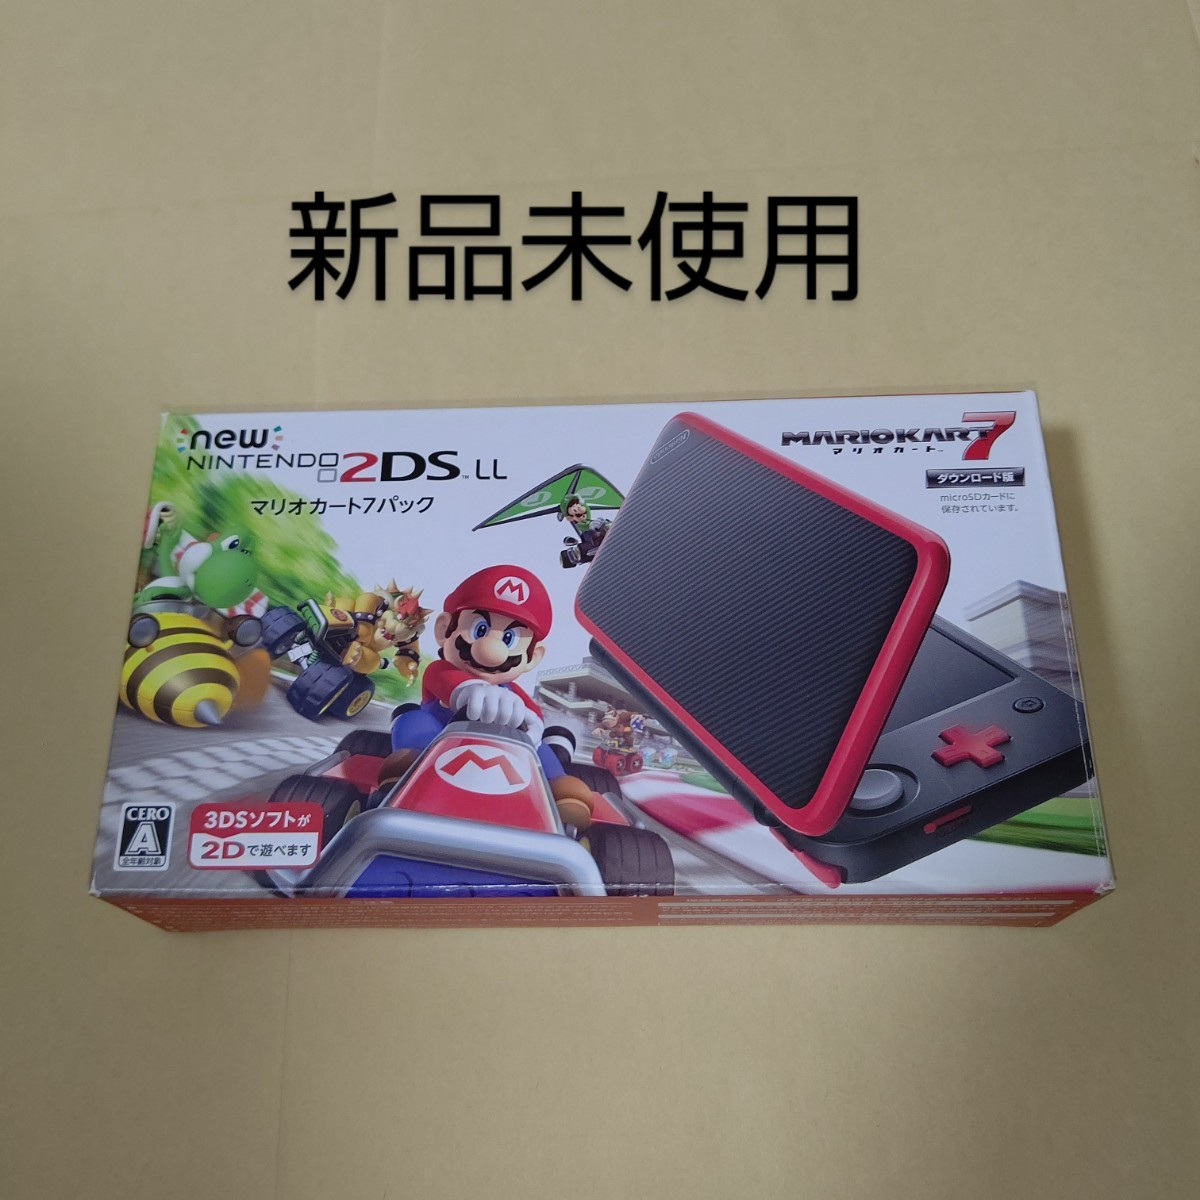 Newニンテンドー2DS LL マリオカート7パック 同梱版 3DS